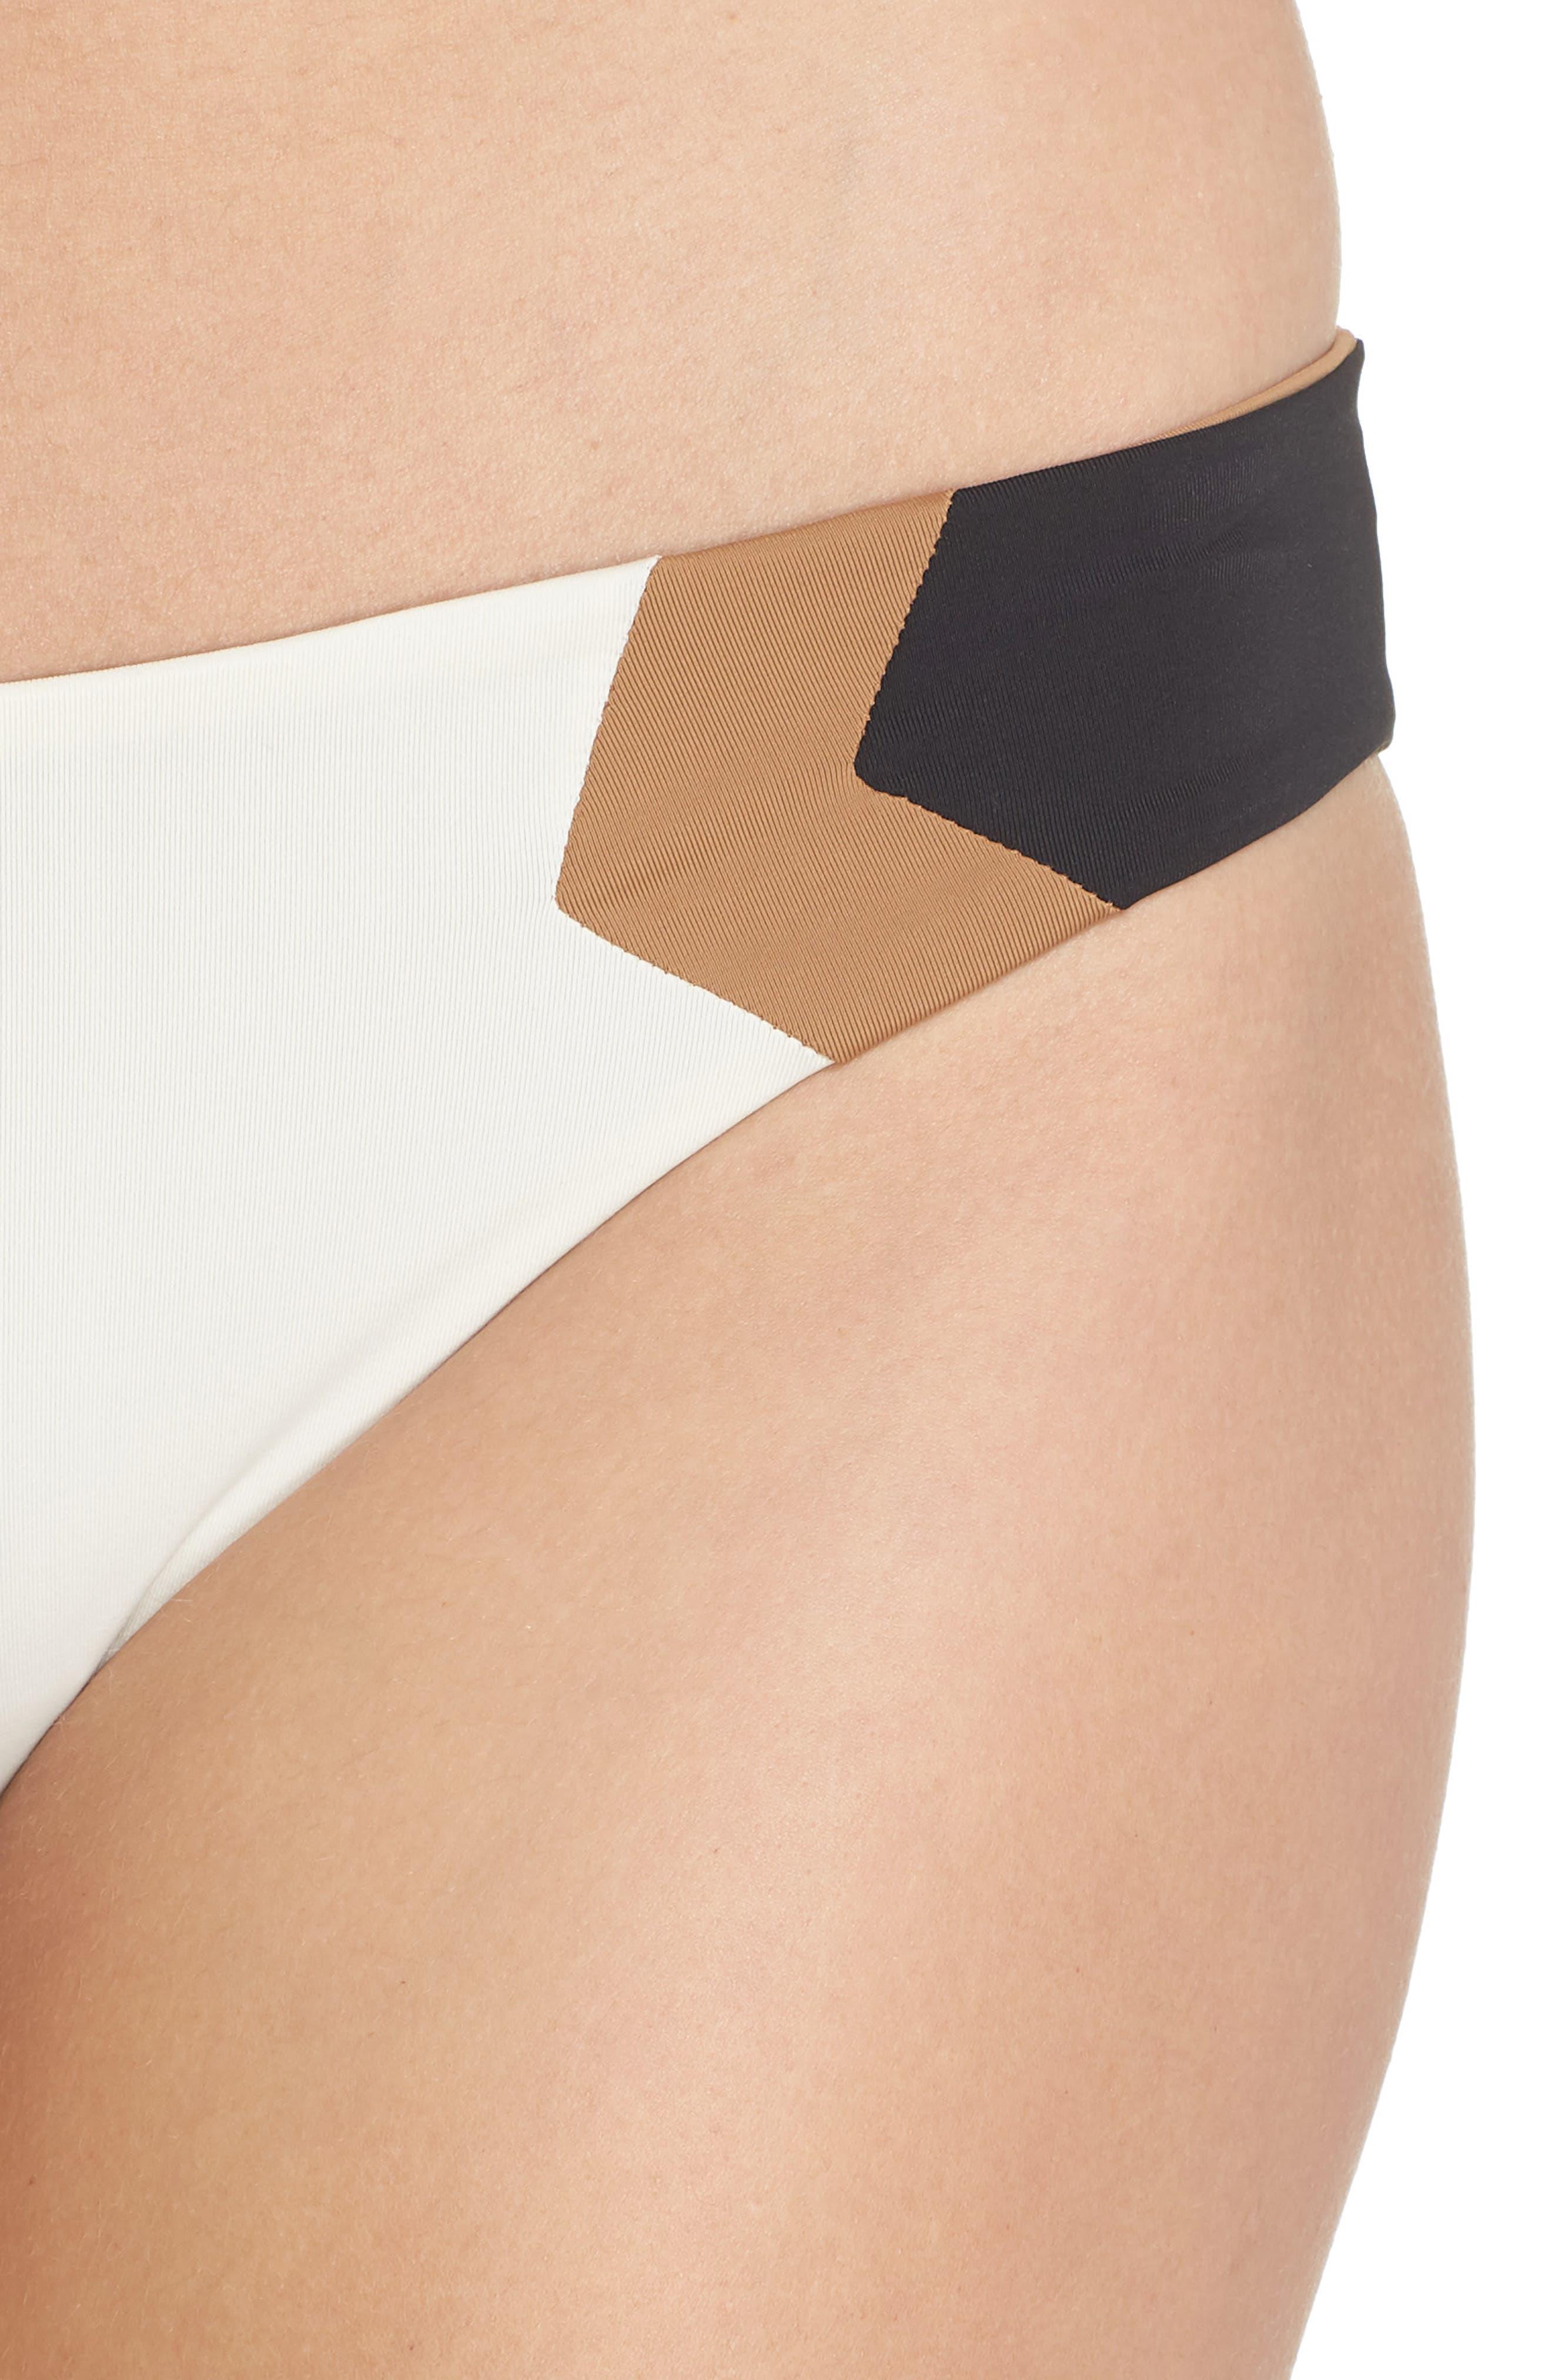 Baracuda Reversible Classic Hipster Bikini Bottoms,                             Alternate thumbnail 4, color,                             Cream/ Black/ Camel